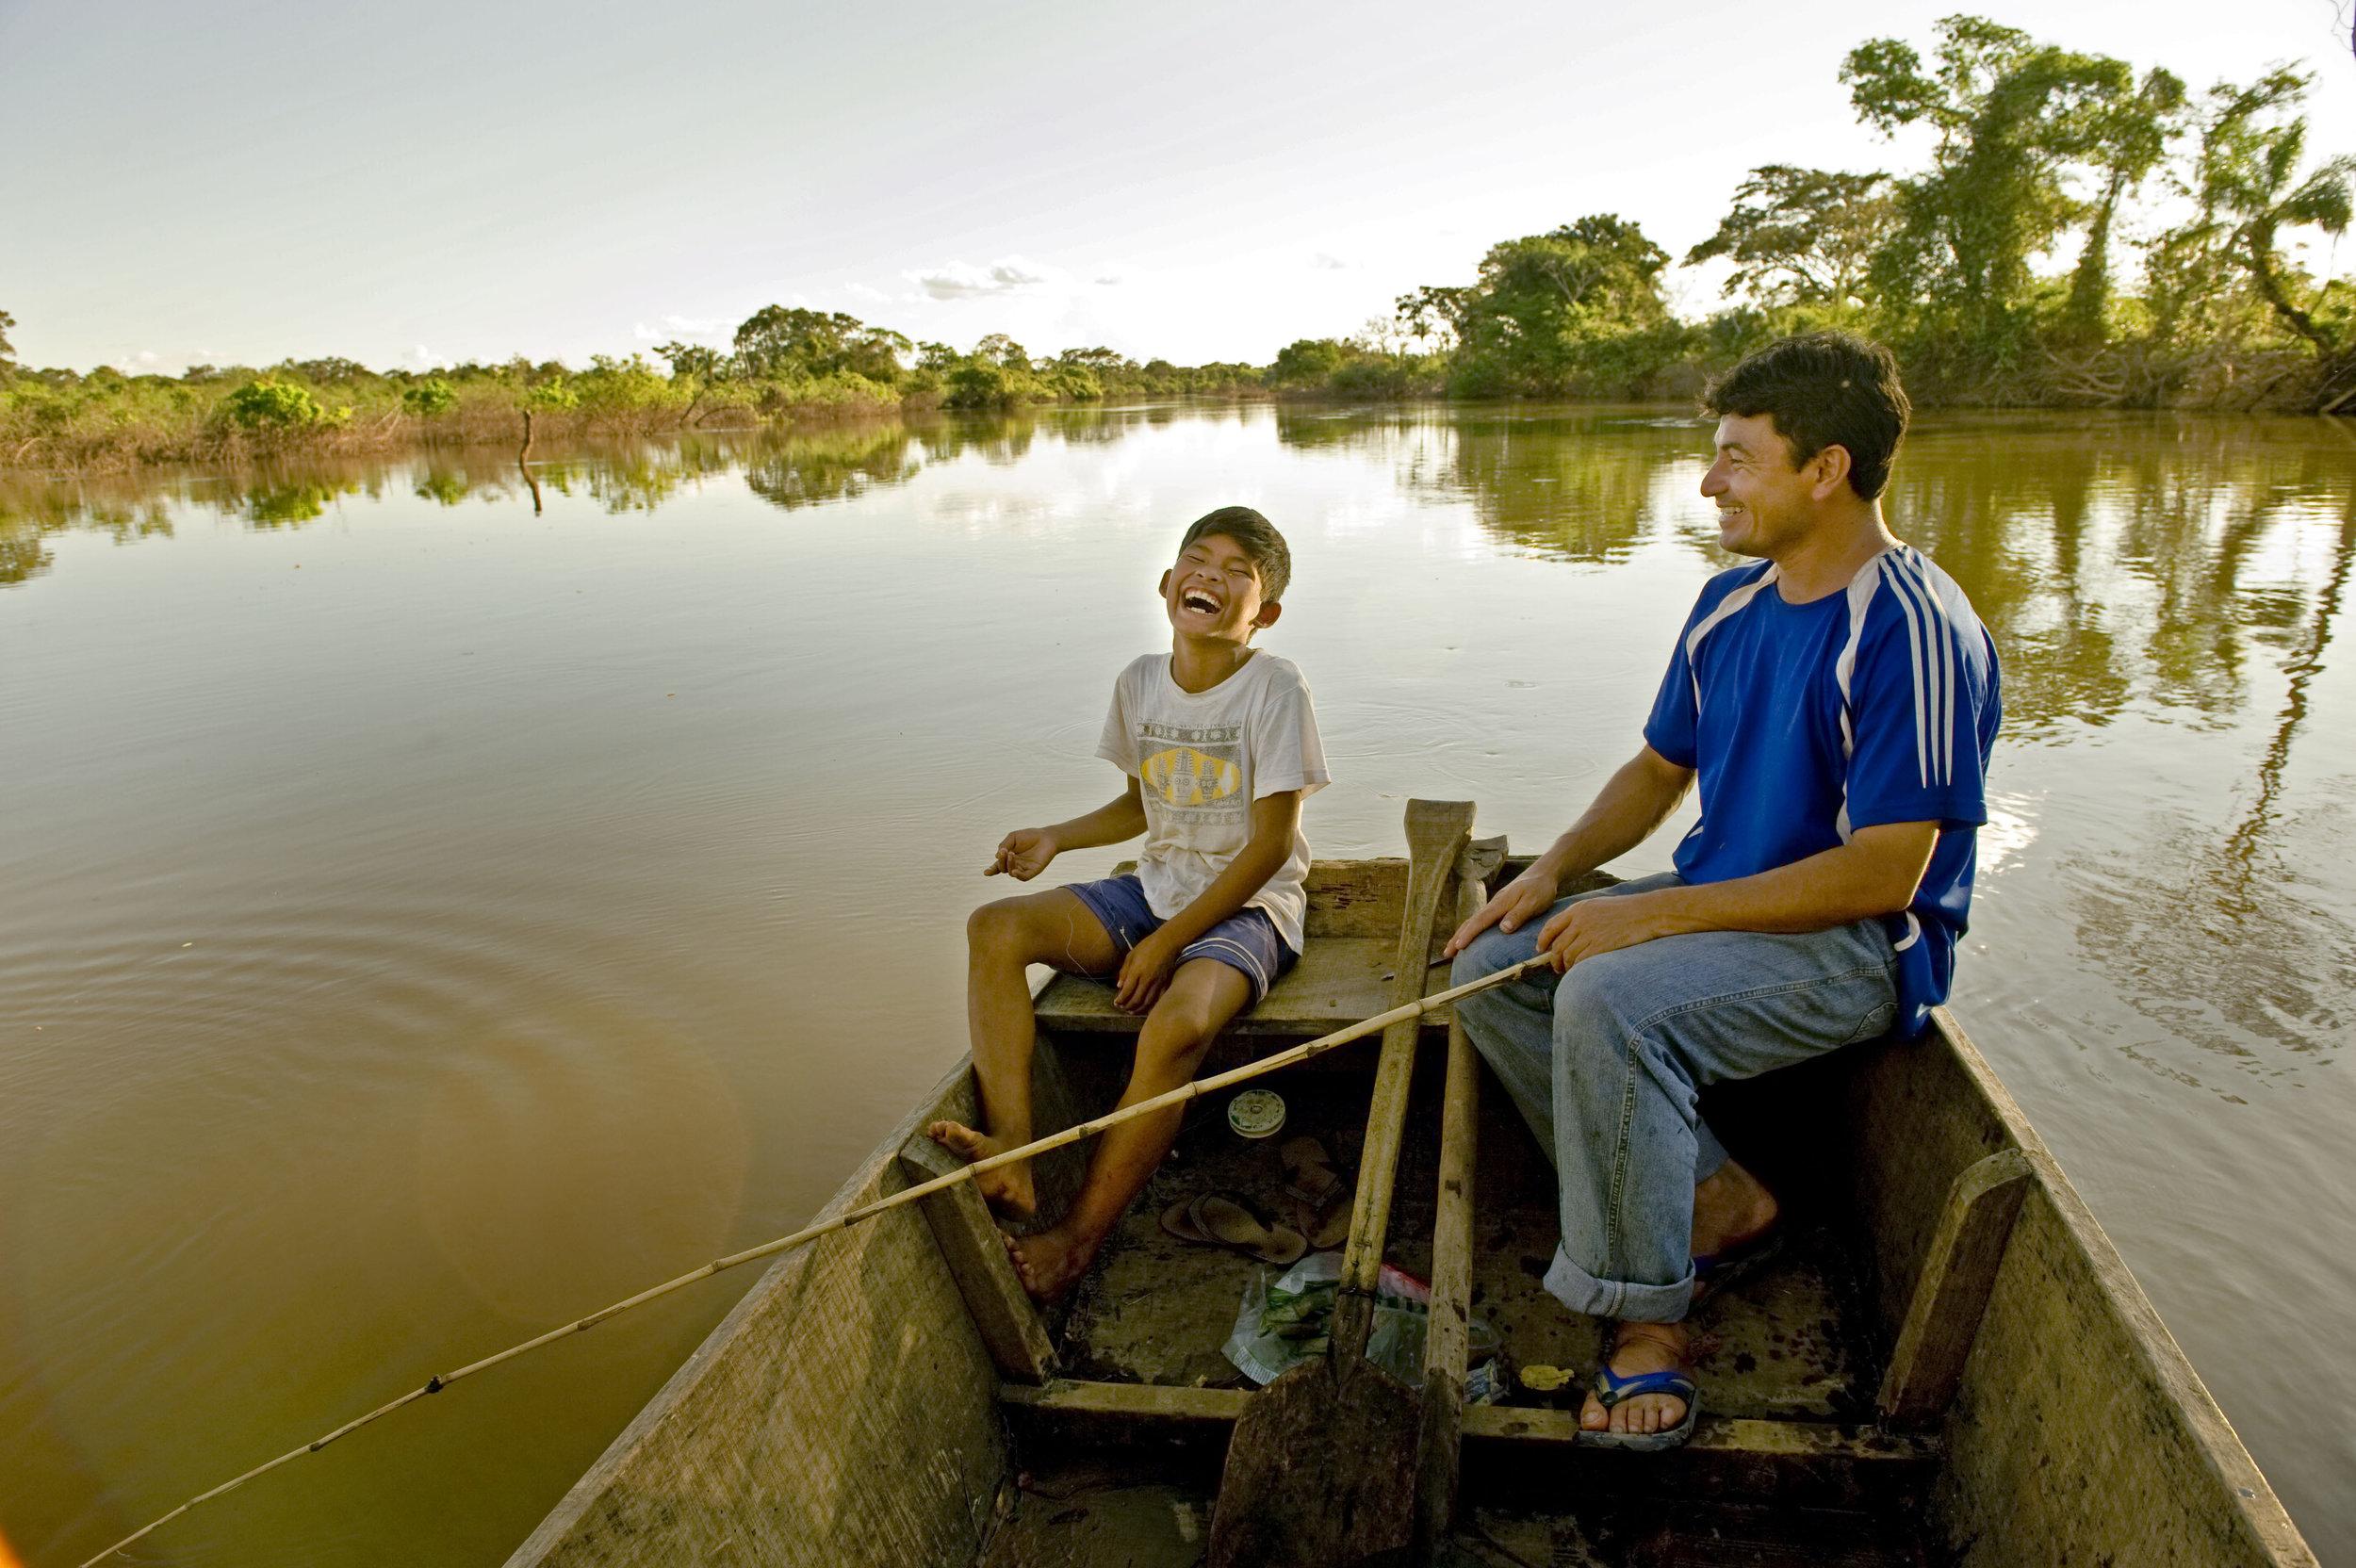 Villagers fishing on the river at Cururu, Bolivia (Photo © Ami Vitale/TNC)